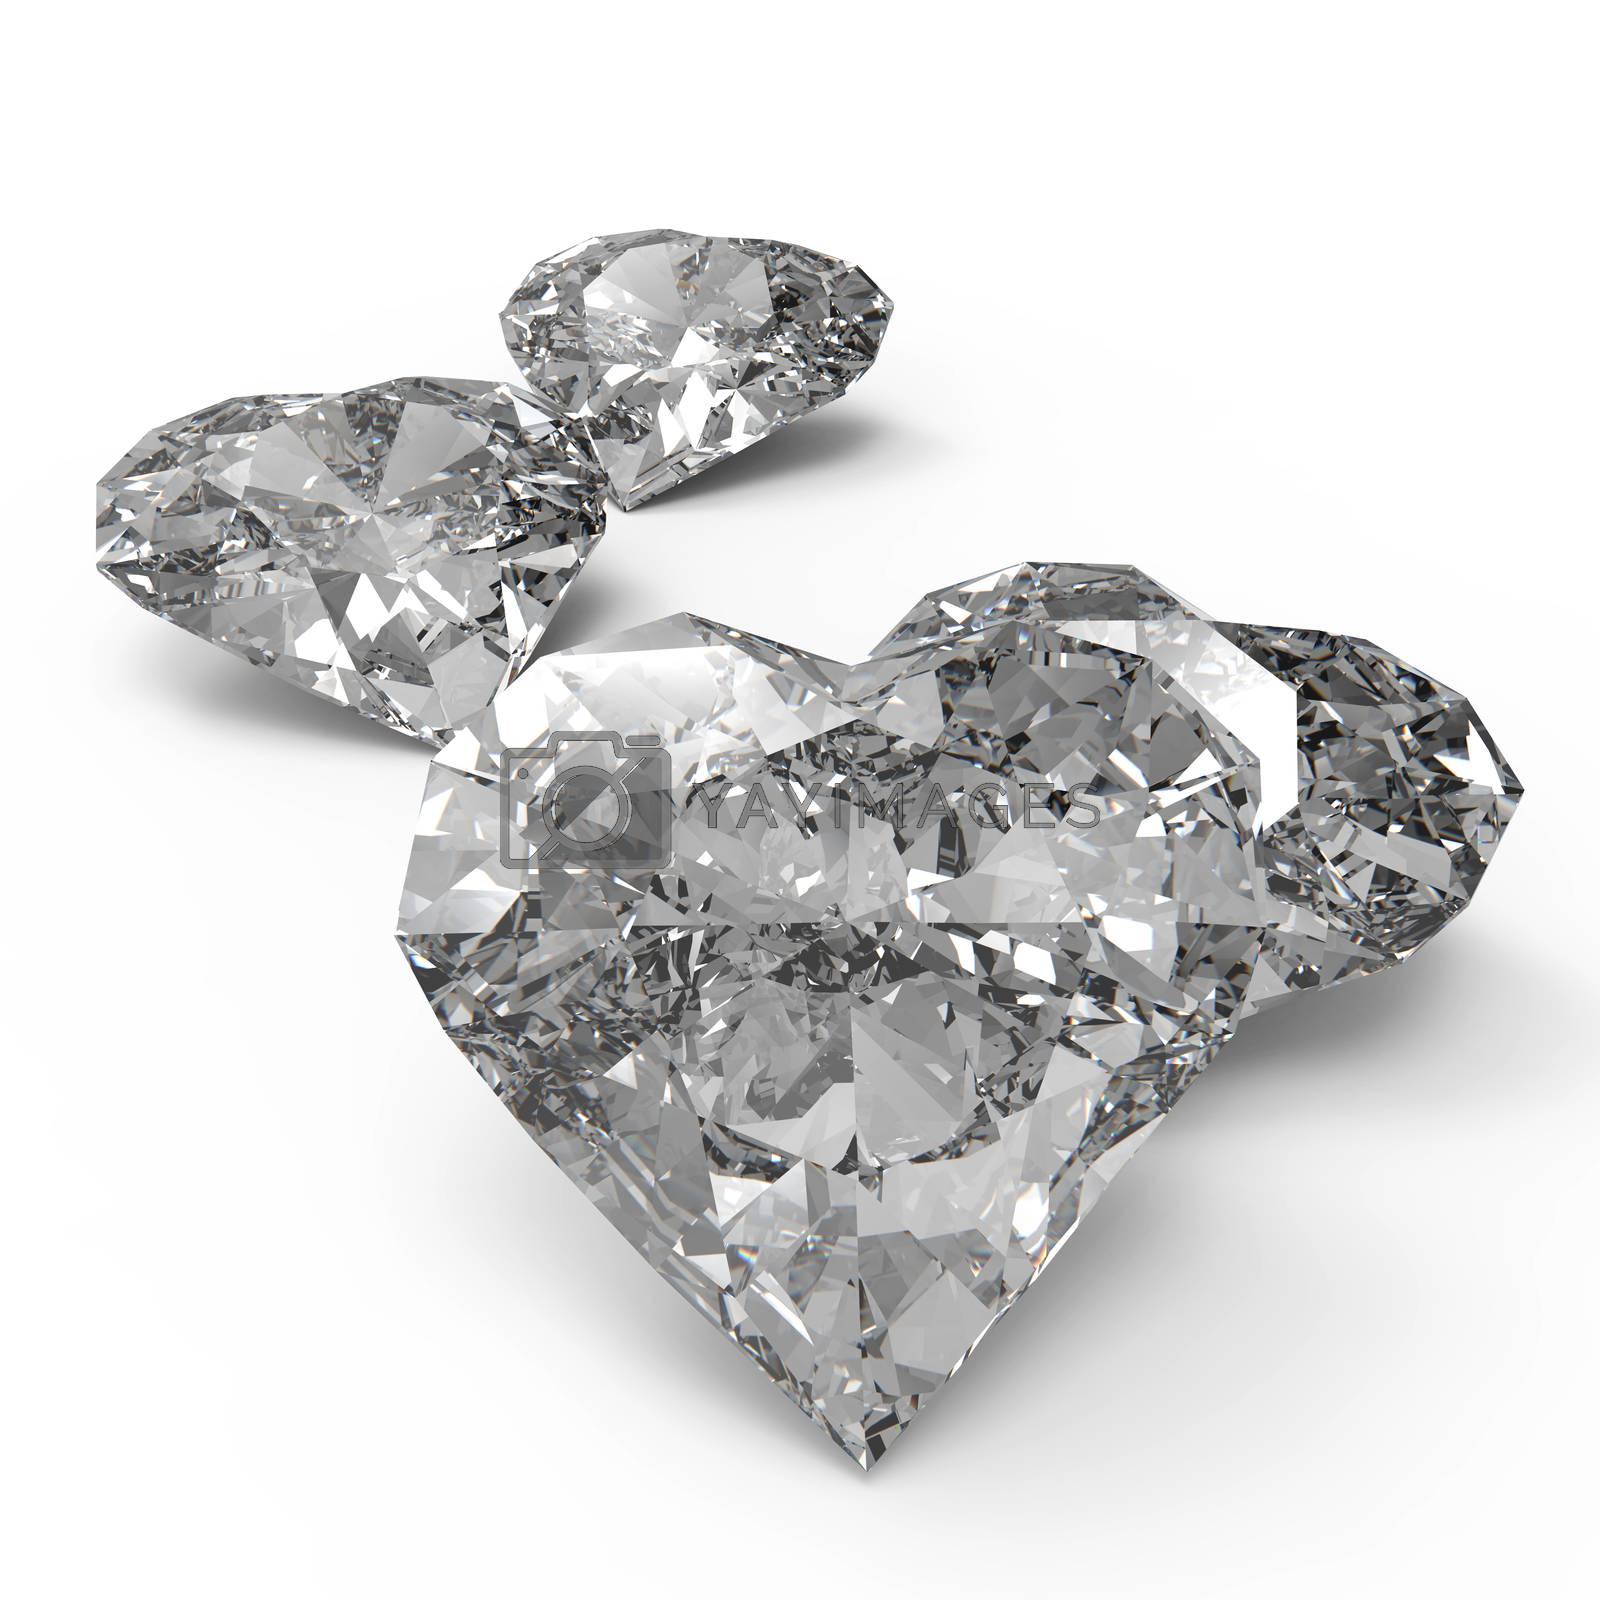 diamond heart shape on black or white surface